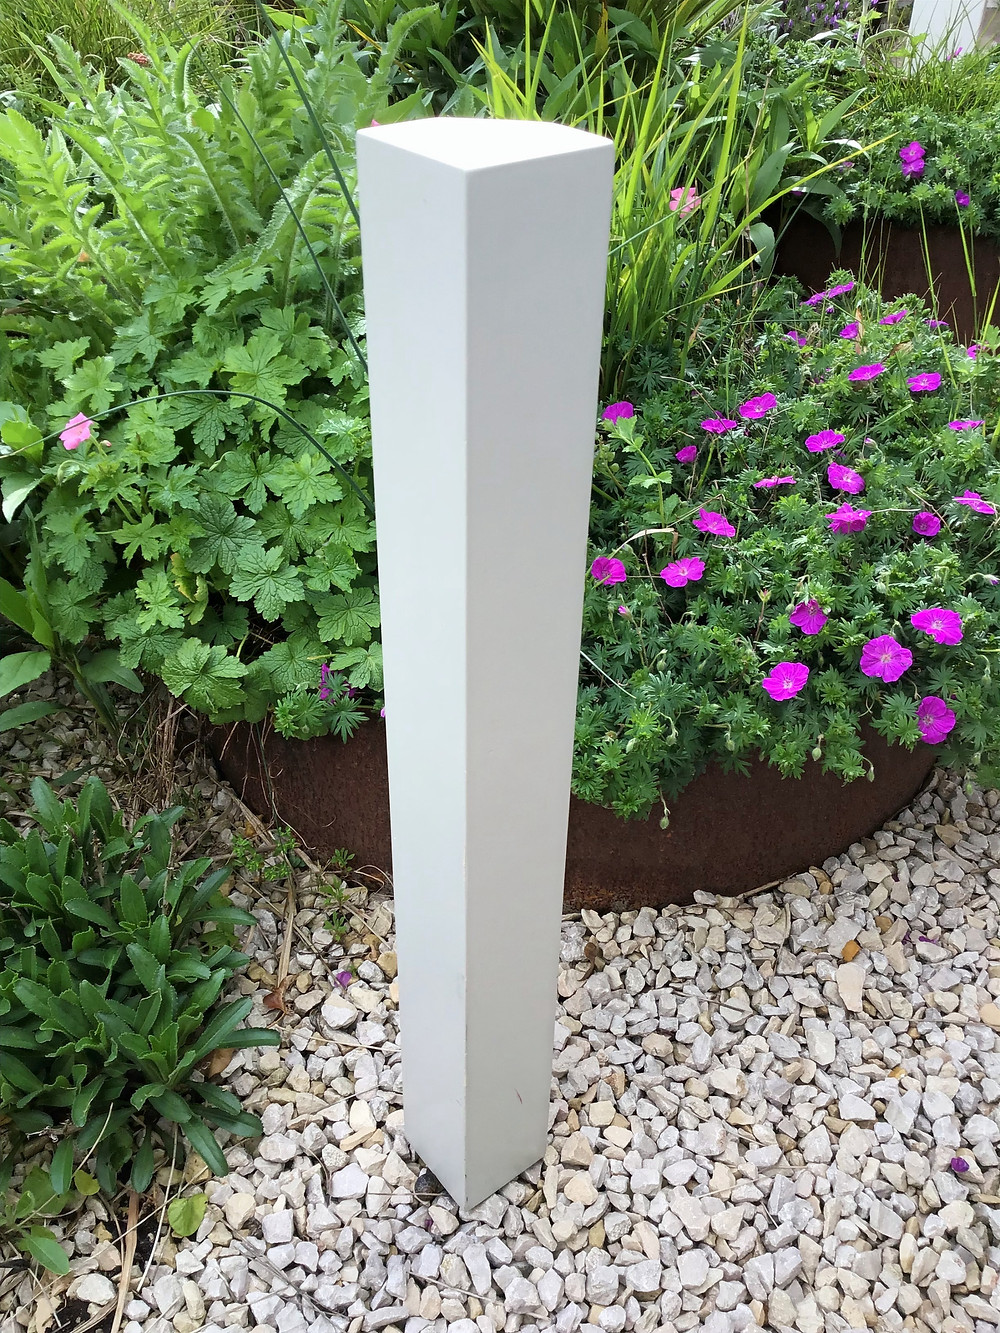 a single table leg standing in the garden